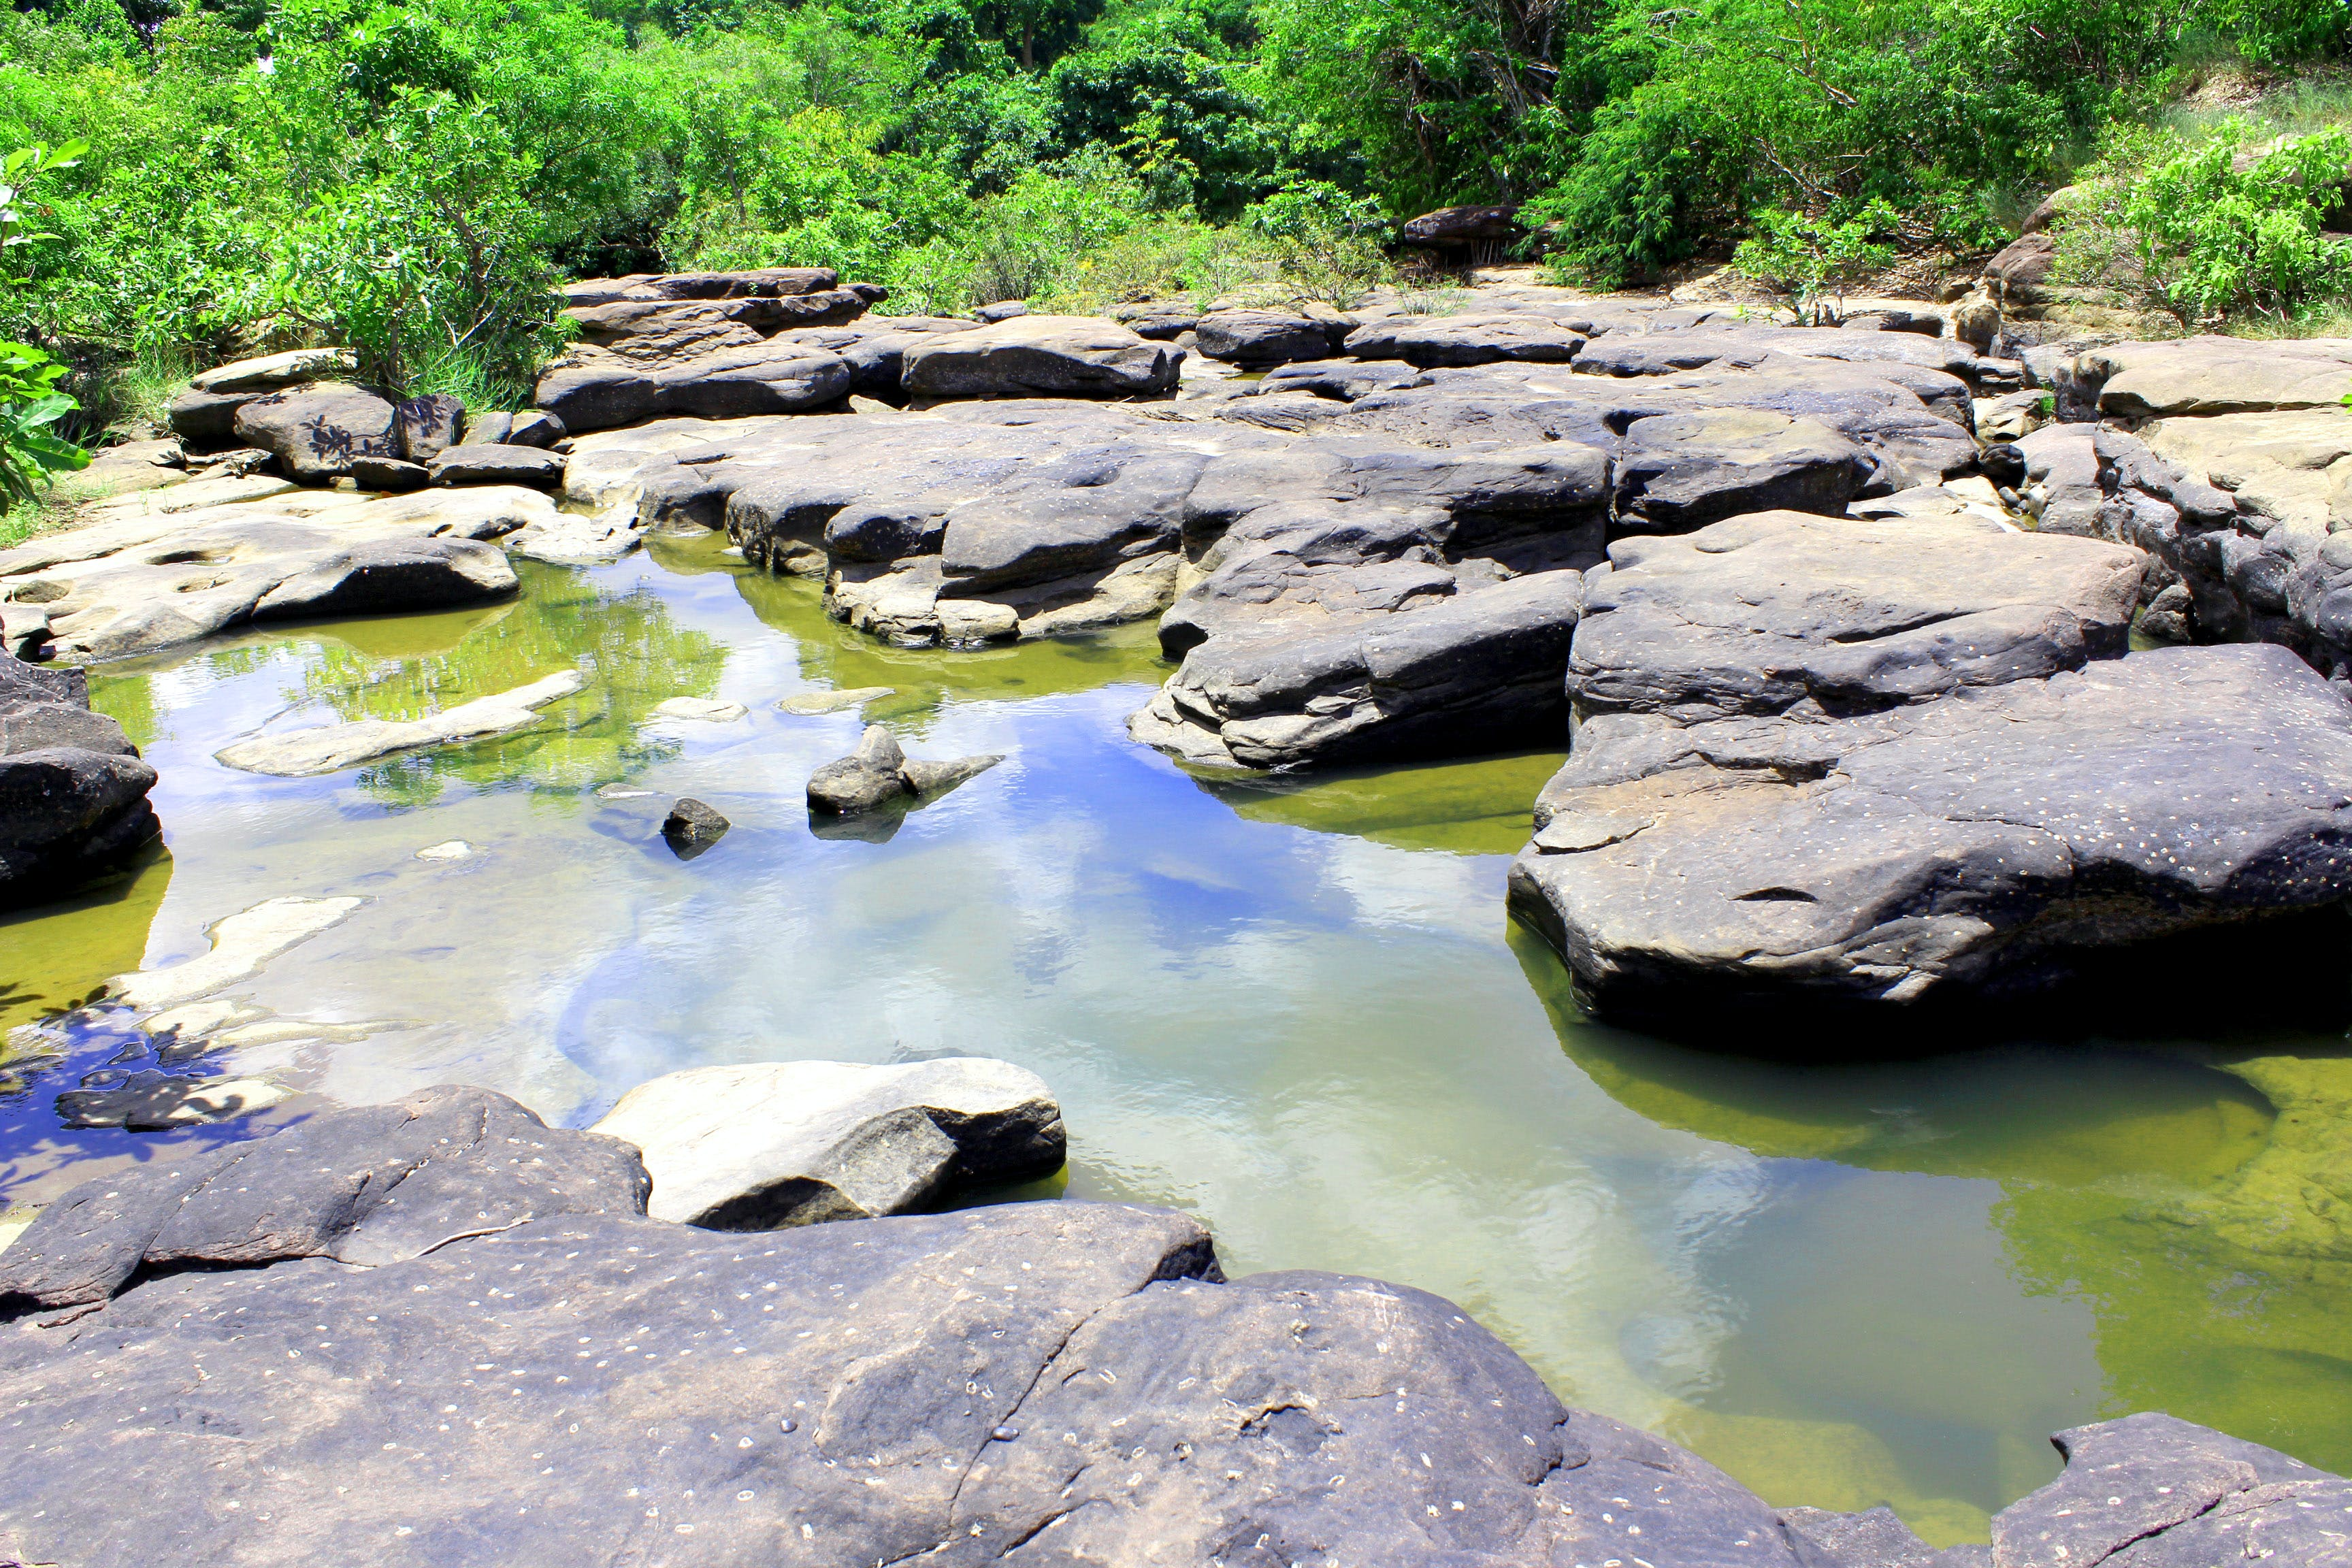 Free stock photo of nature, water, rocks, moss